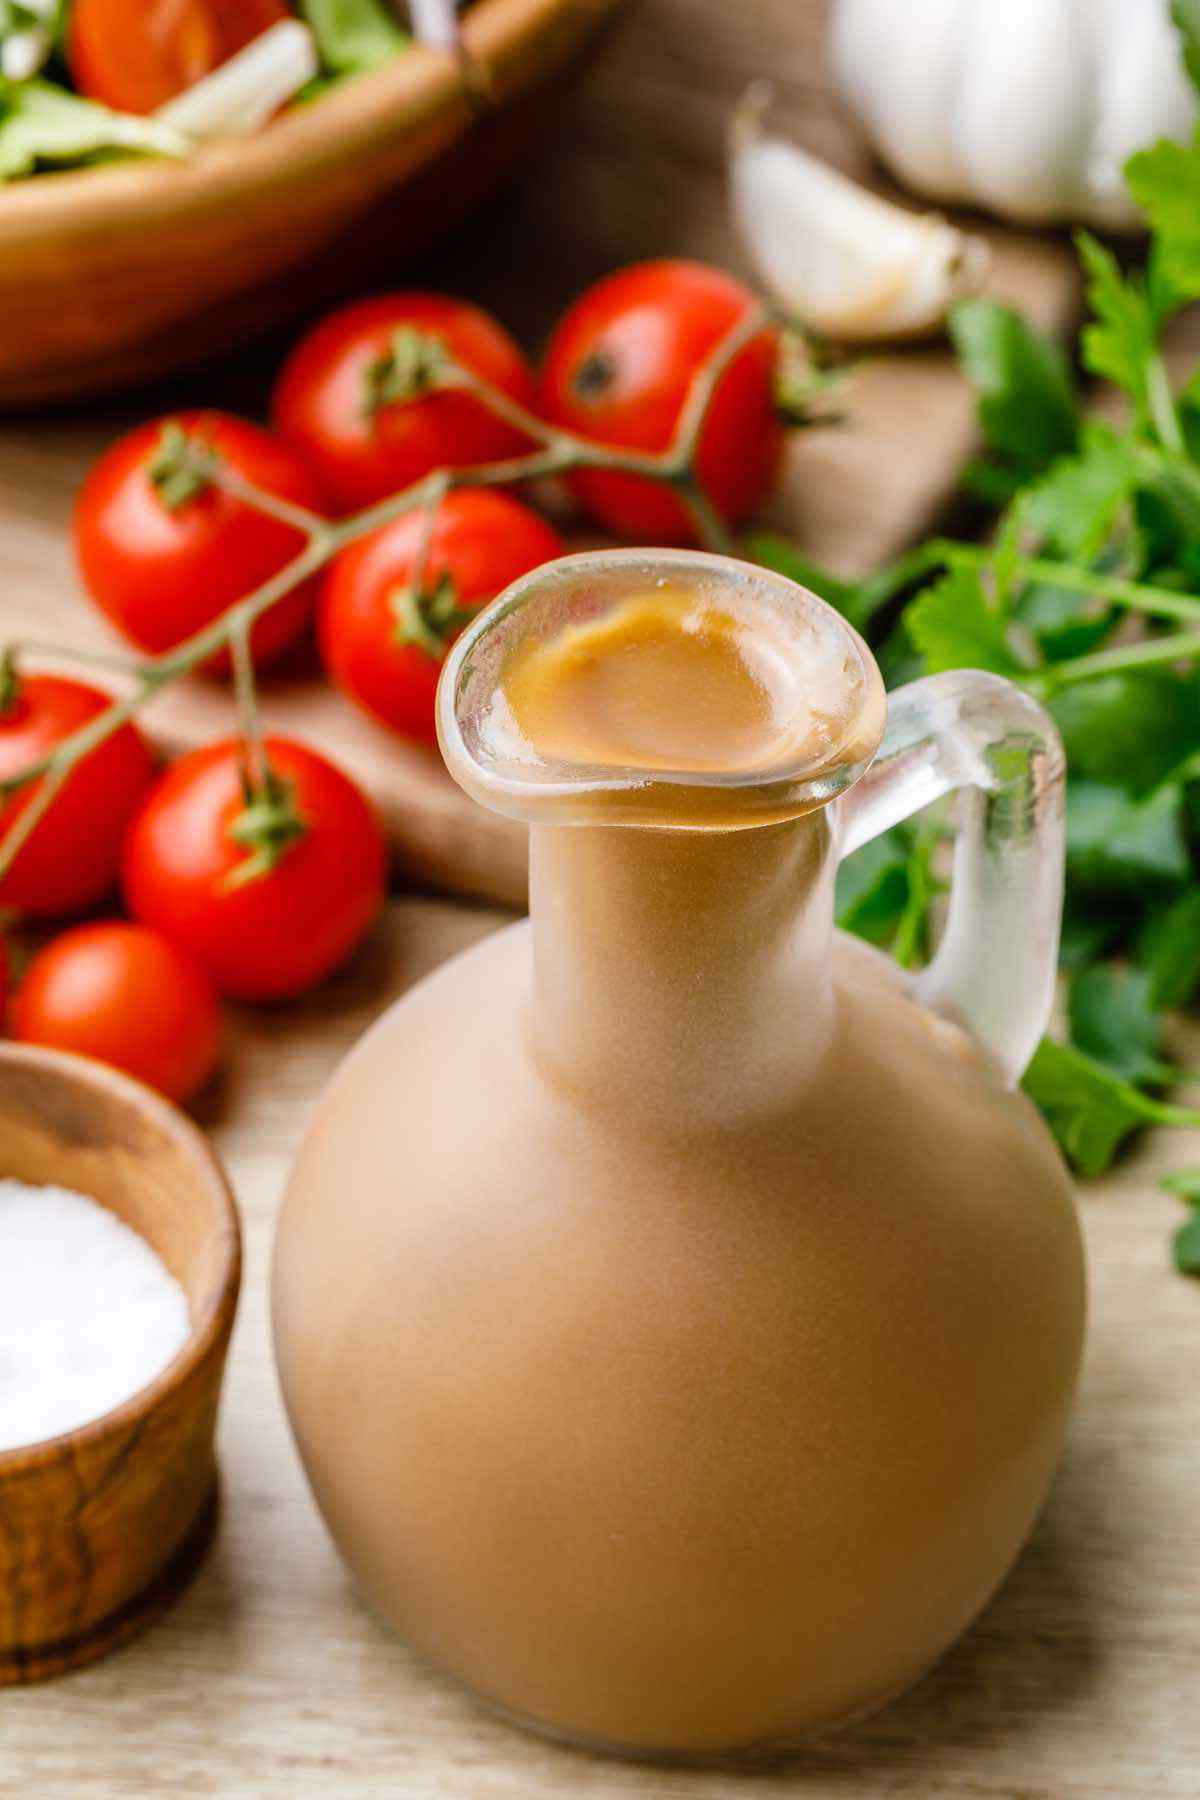 Paleo Balsamic Vinaigrette Salad Dressing